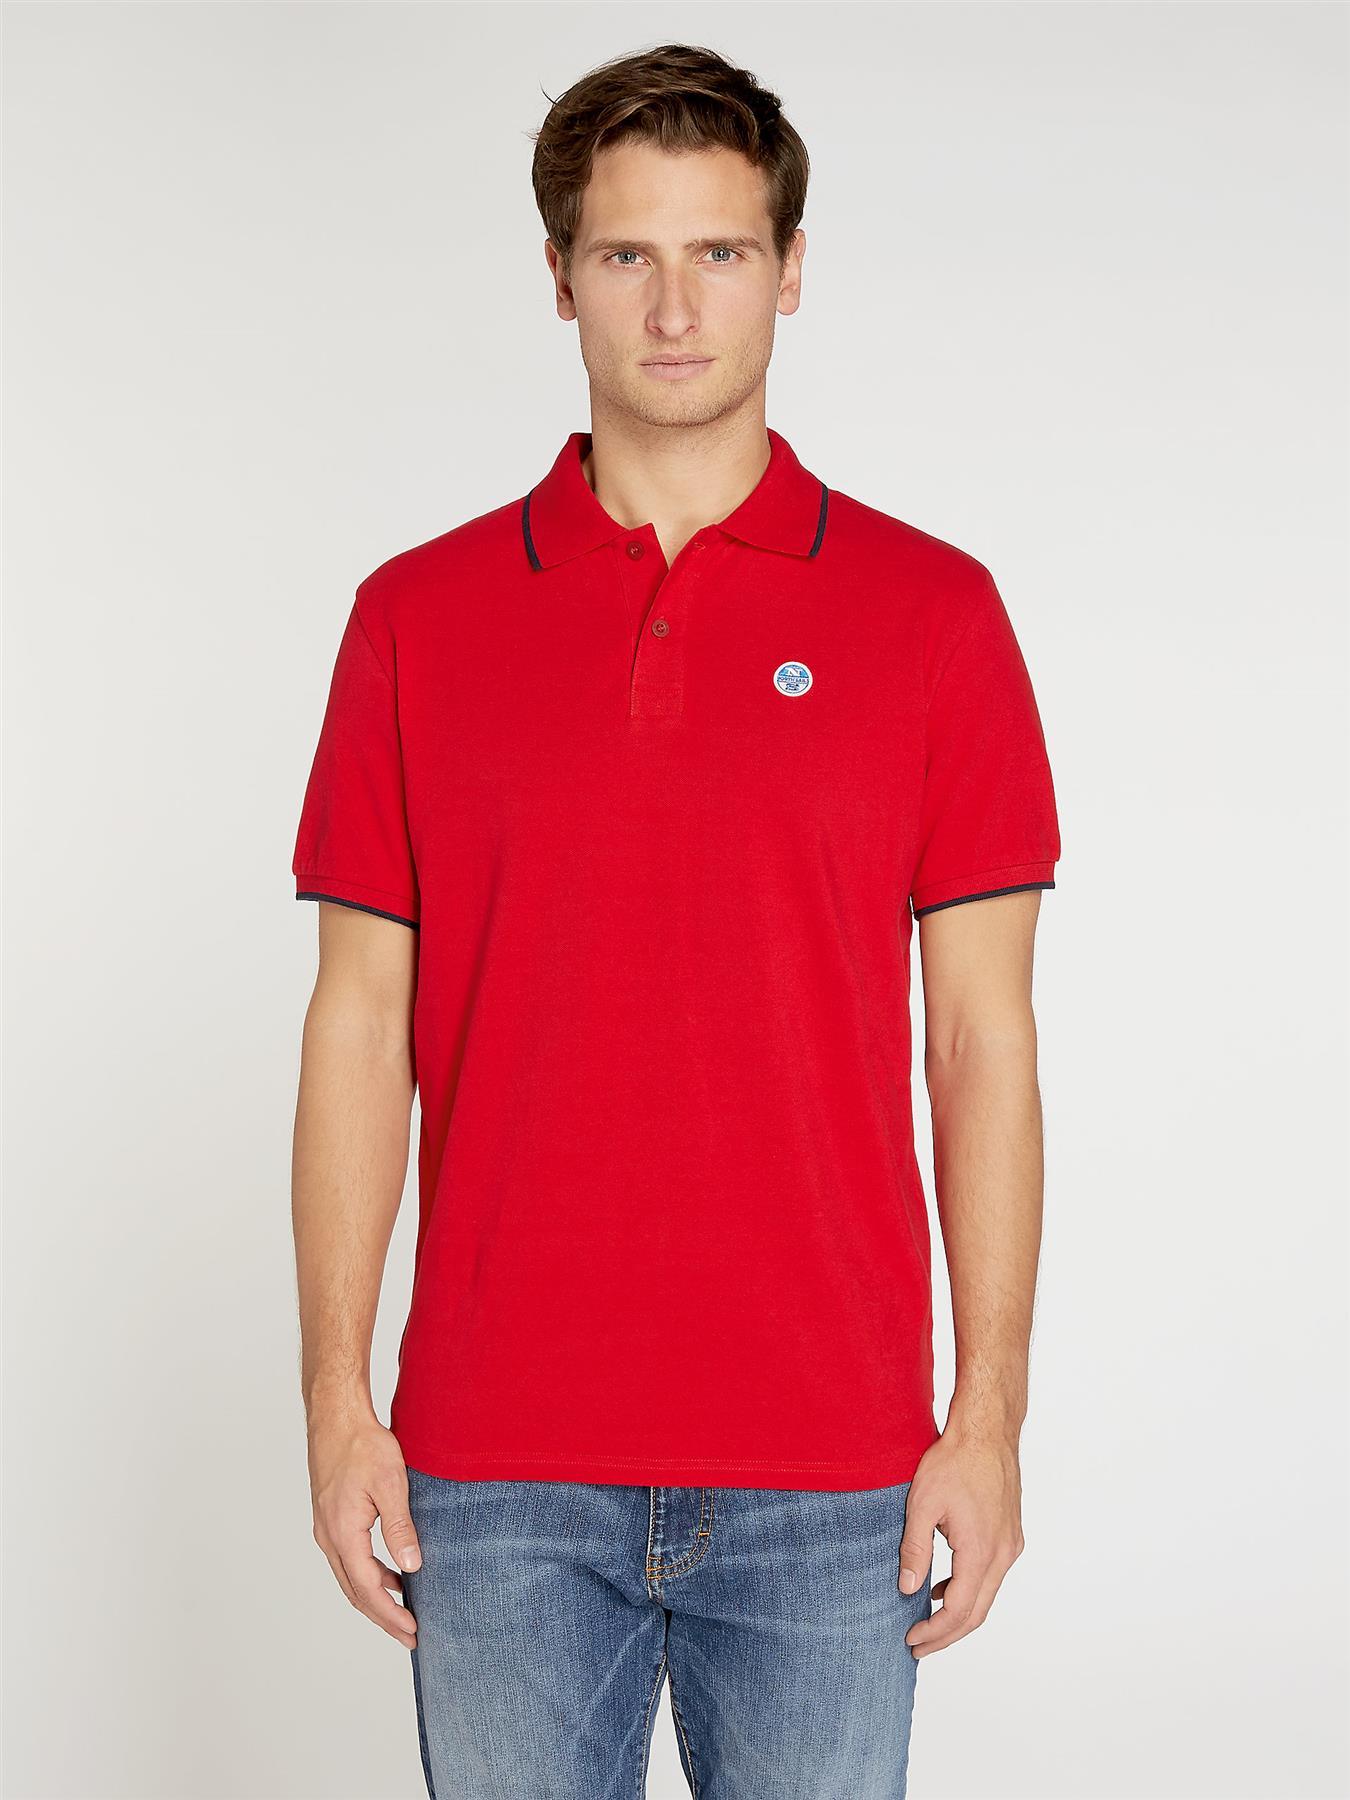 NORTH-SAILS-Mens-Legacy-Heritage-Short-Sleeve-Polo-Shirt-SALE-RRP-50 thumbnail 51